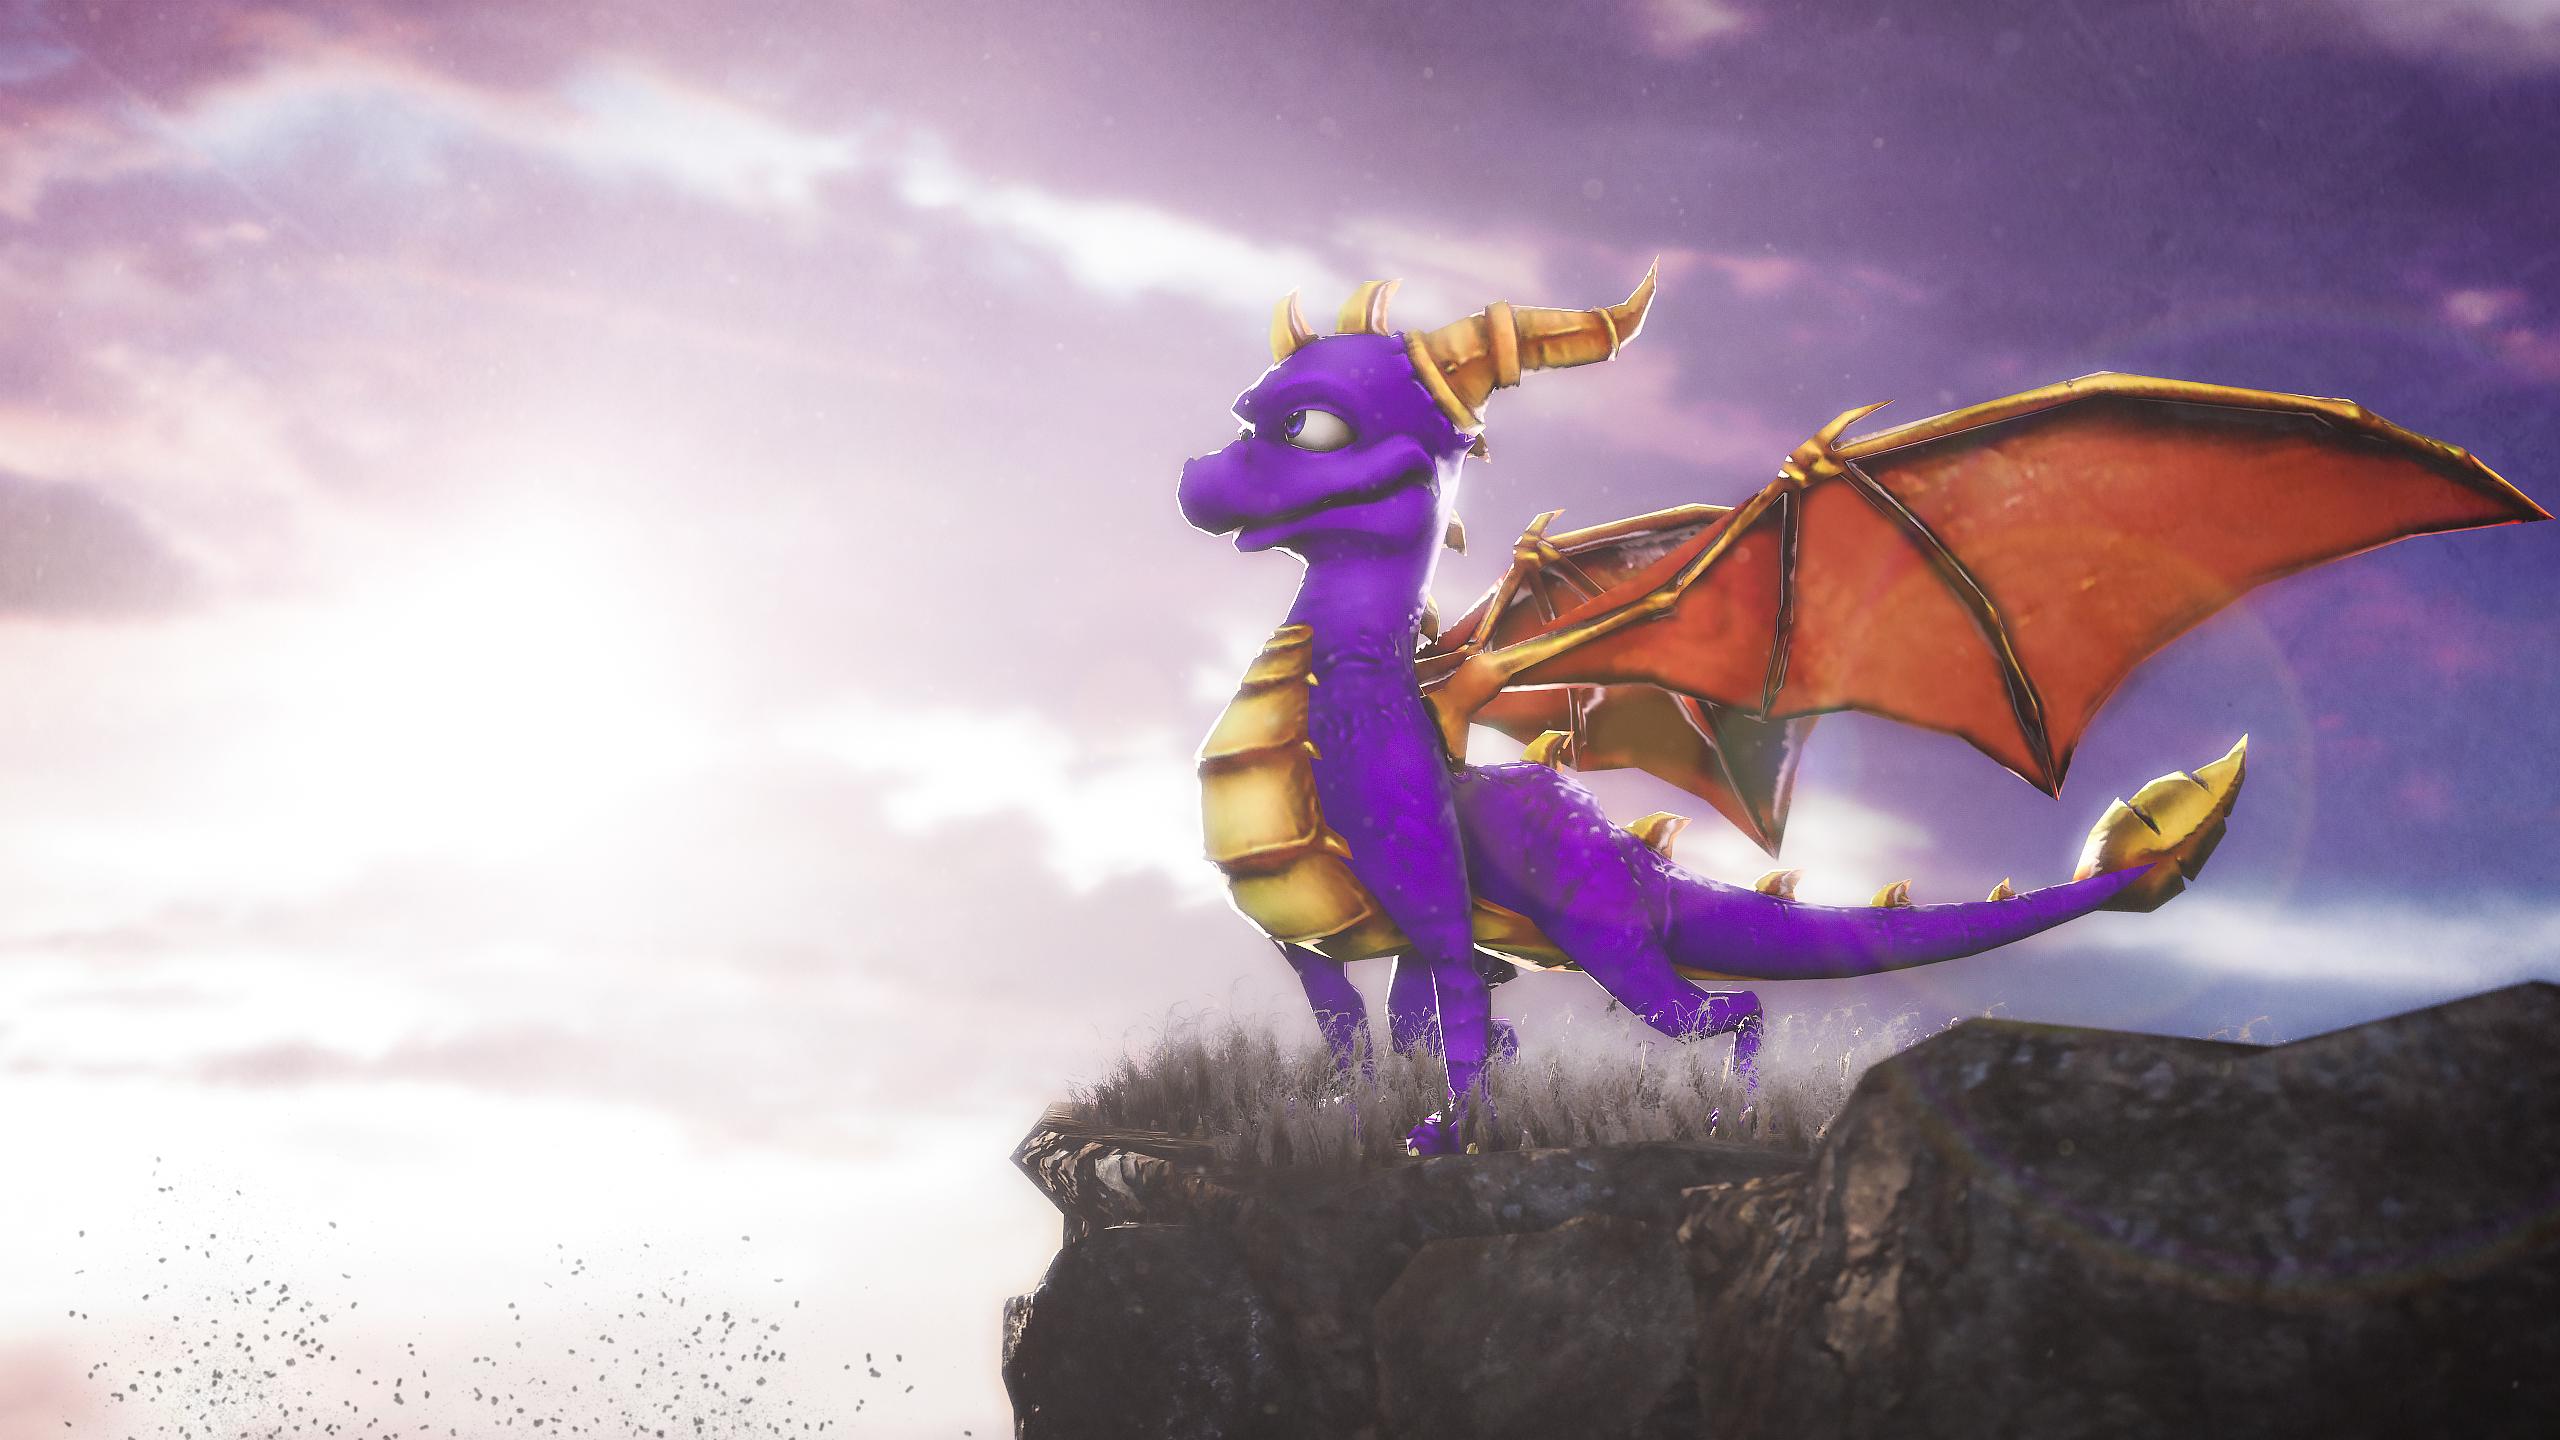 Sfm spyro dawn of the dragon menu by anleas on deviantart - Spyro wallpaper ...